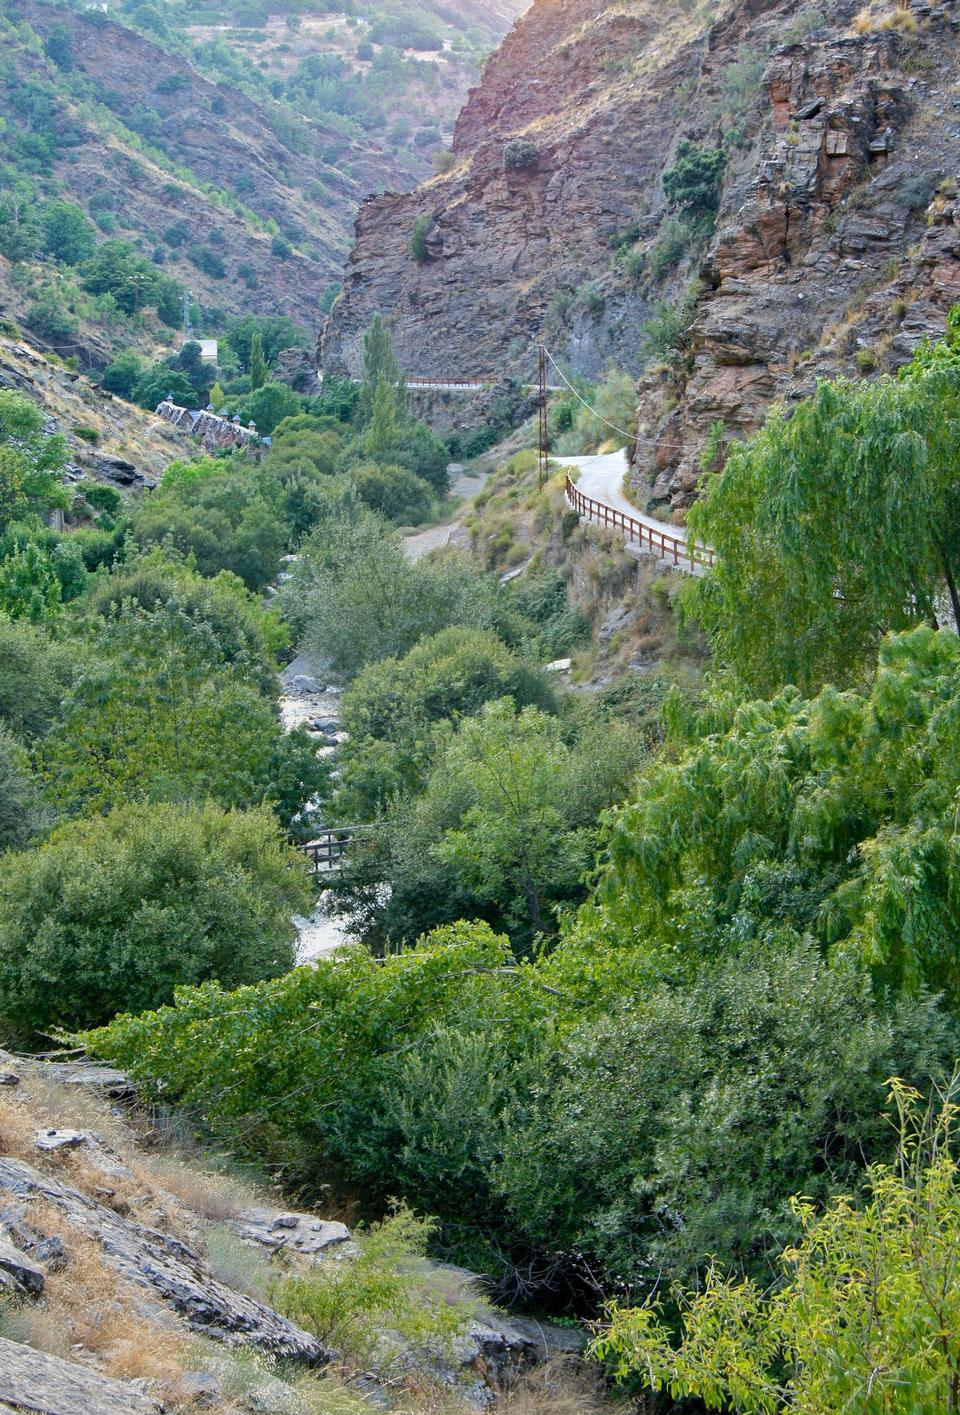 The Rio Genil valley, in Sierra Nevada